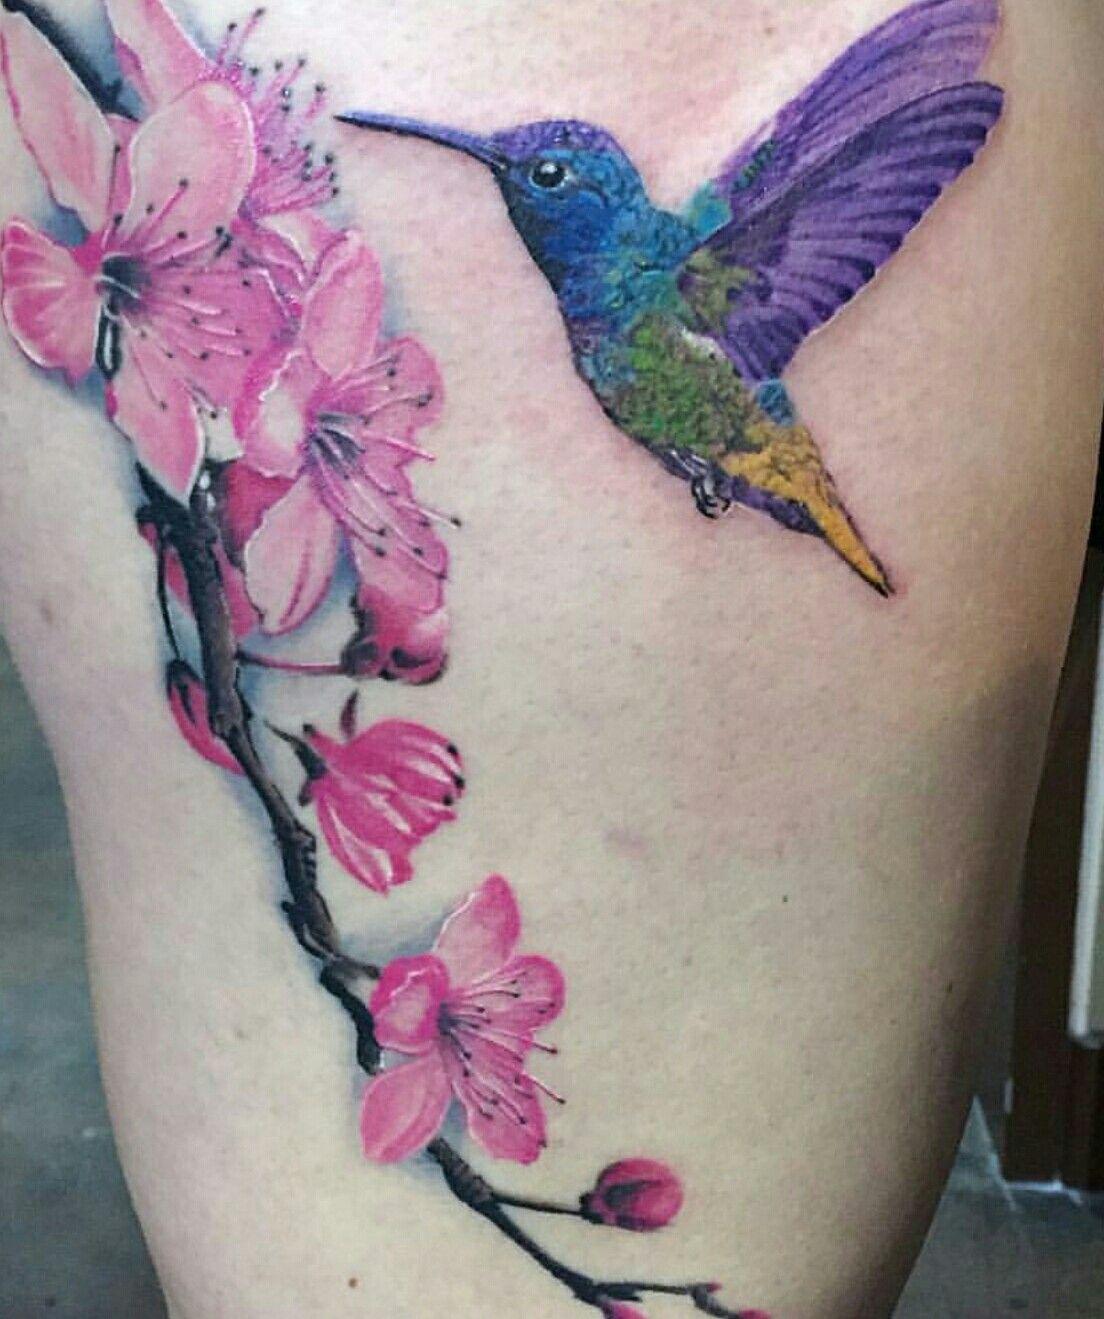 De colibri en la espalda significado tatuaje colibri tatuaje tattoo - Hummingbird Tattoo Me Entiendesflores De Cerezotatuaje De Colibr Altoplantillasbrazosamigostintatatuajes Mam